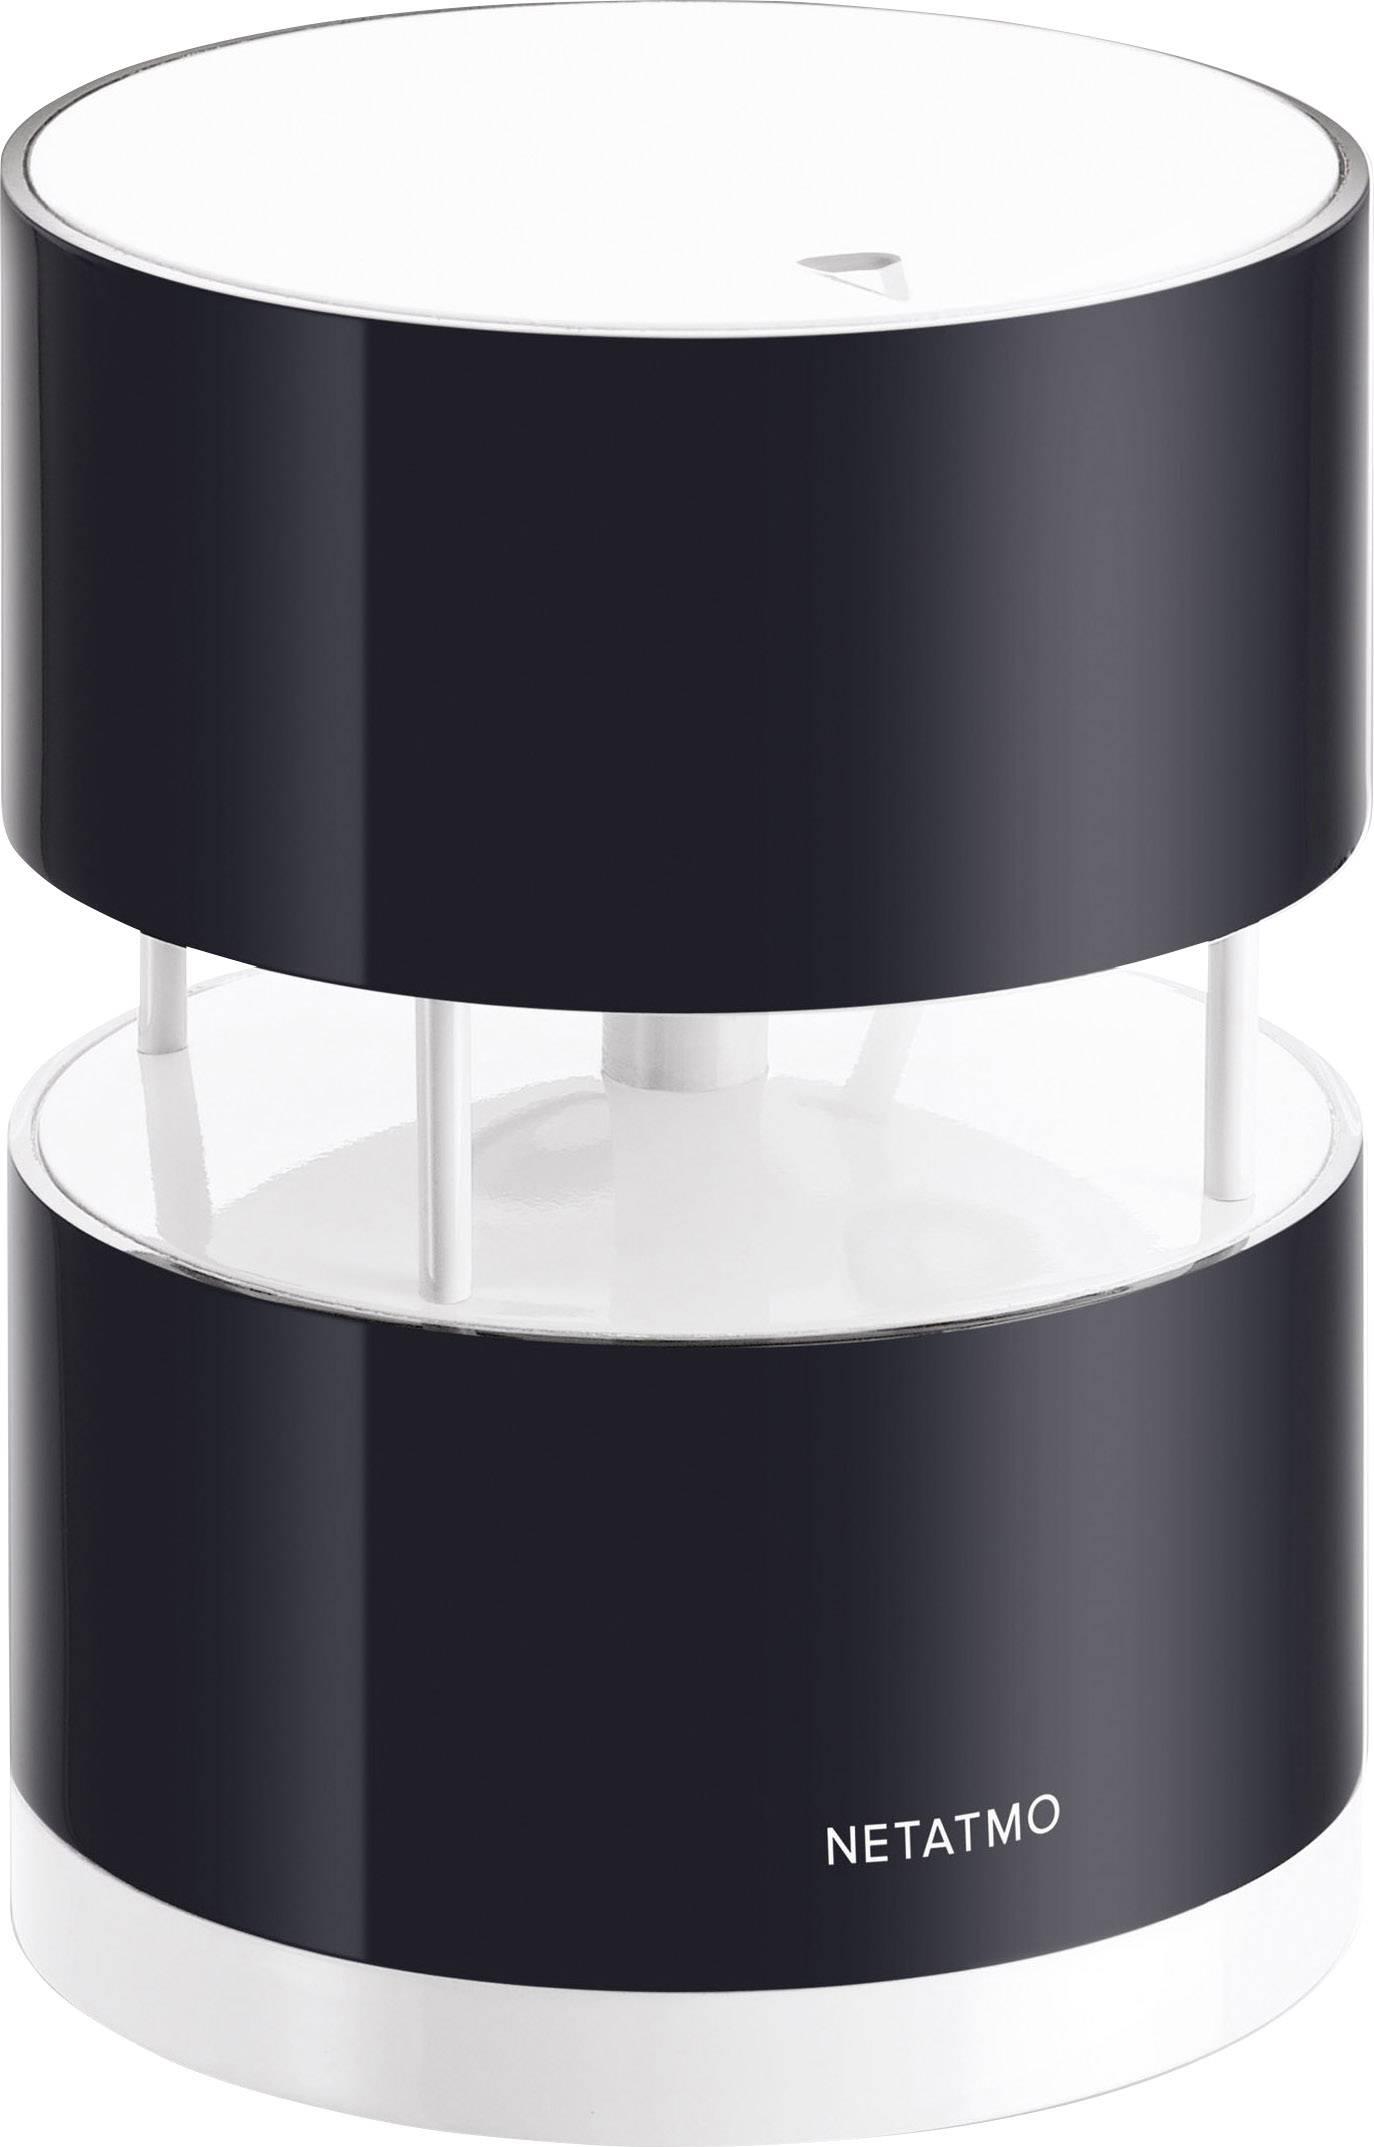 Ultrazvukový anemometr Netatmo NWA01-WW vhodný pro meteostanici Netatmo